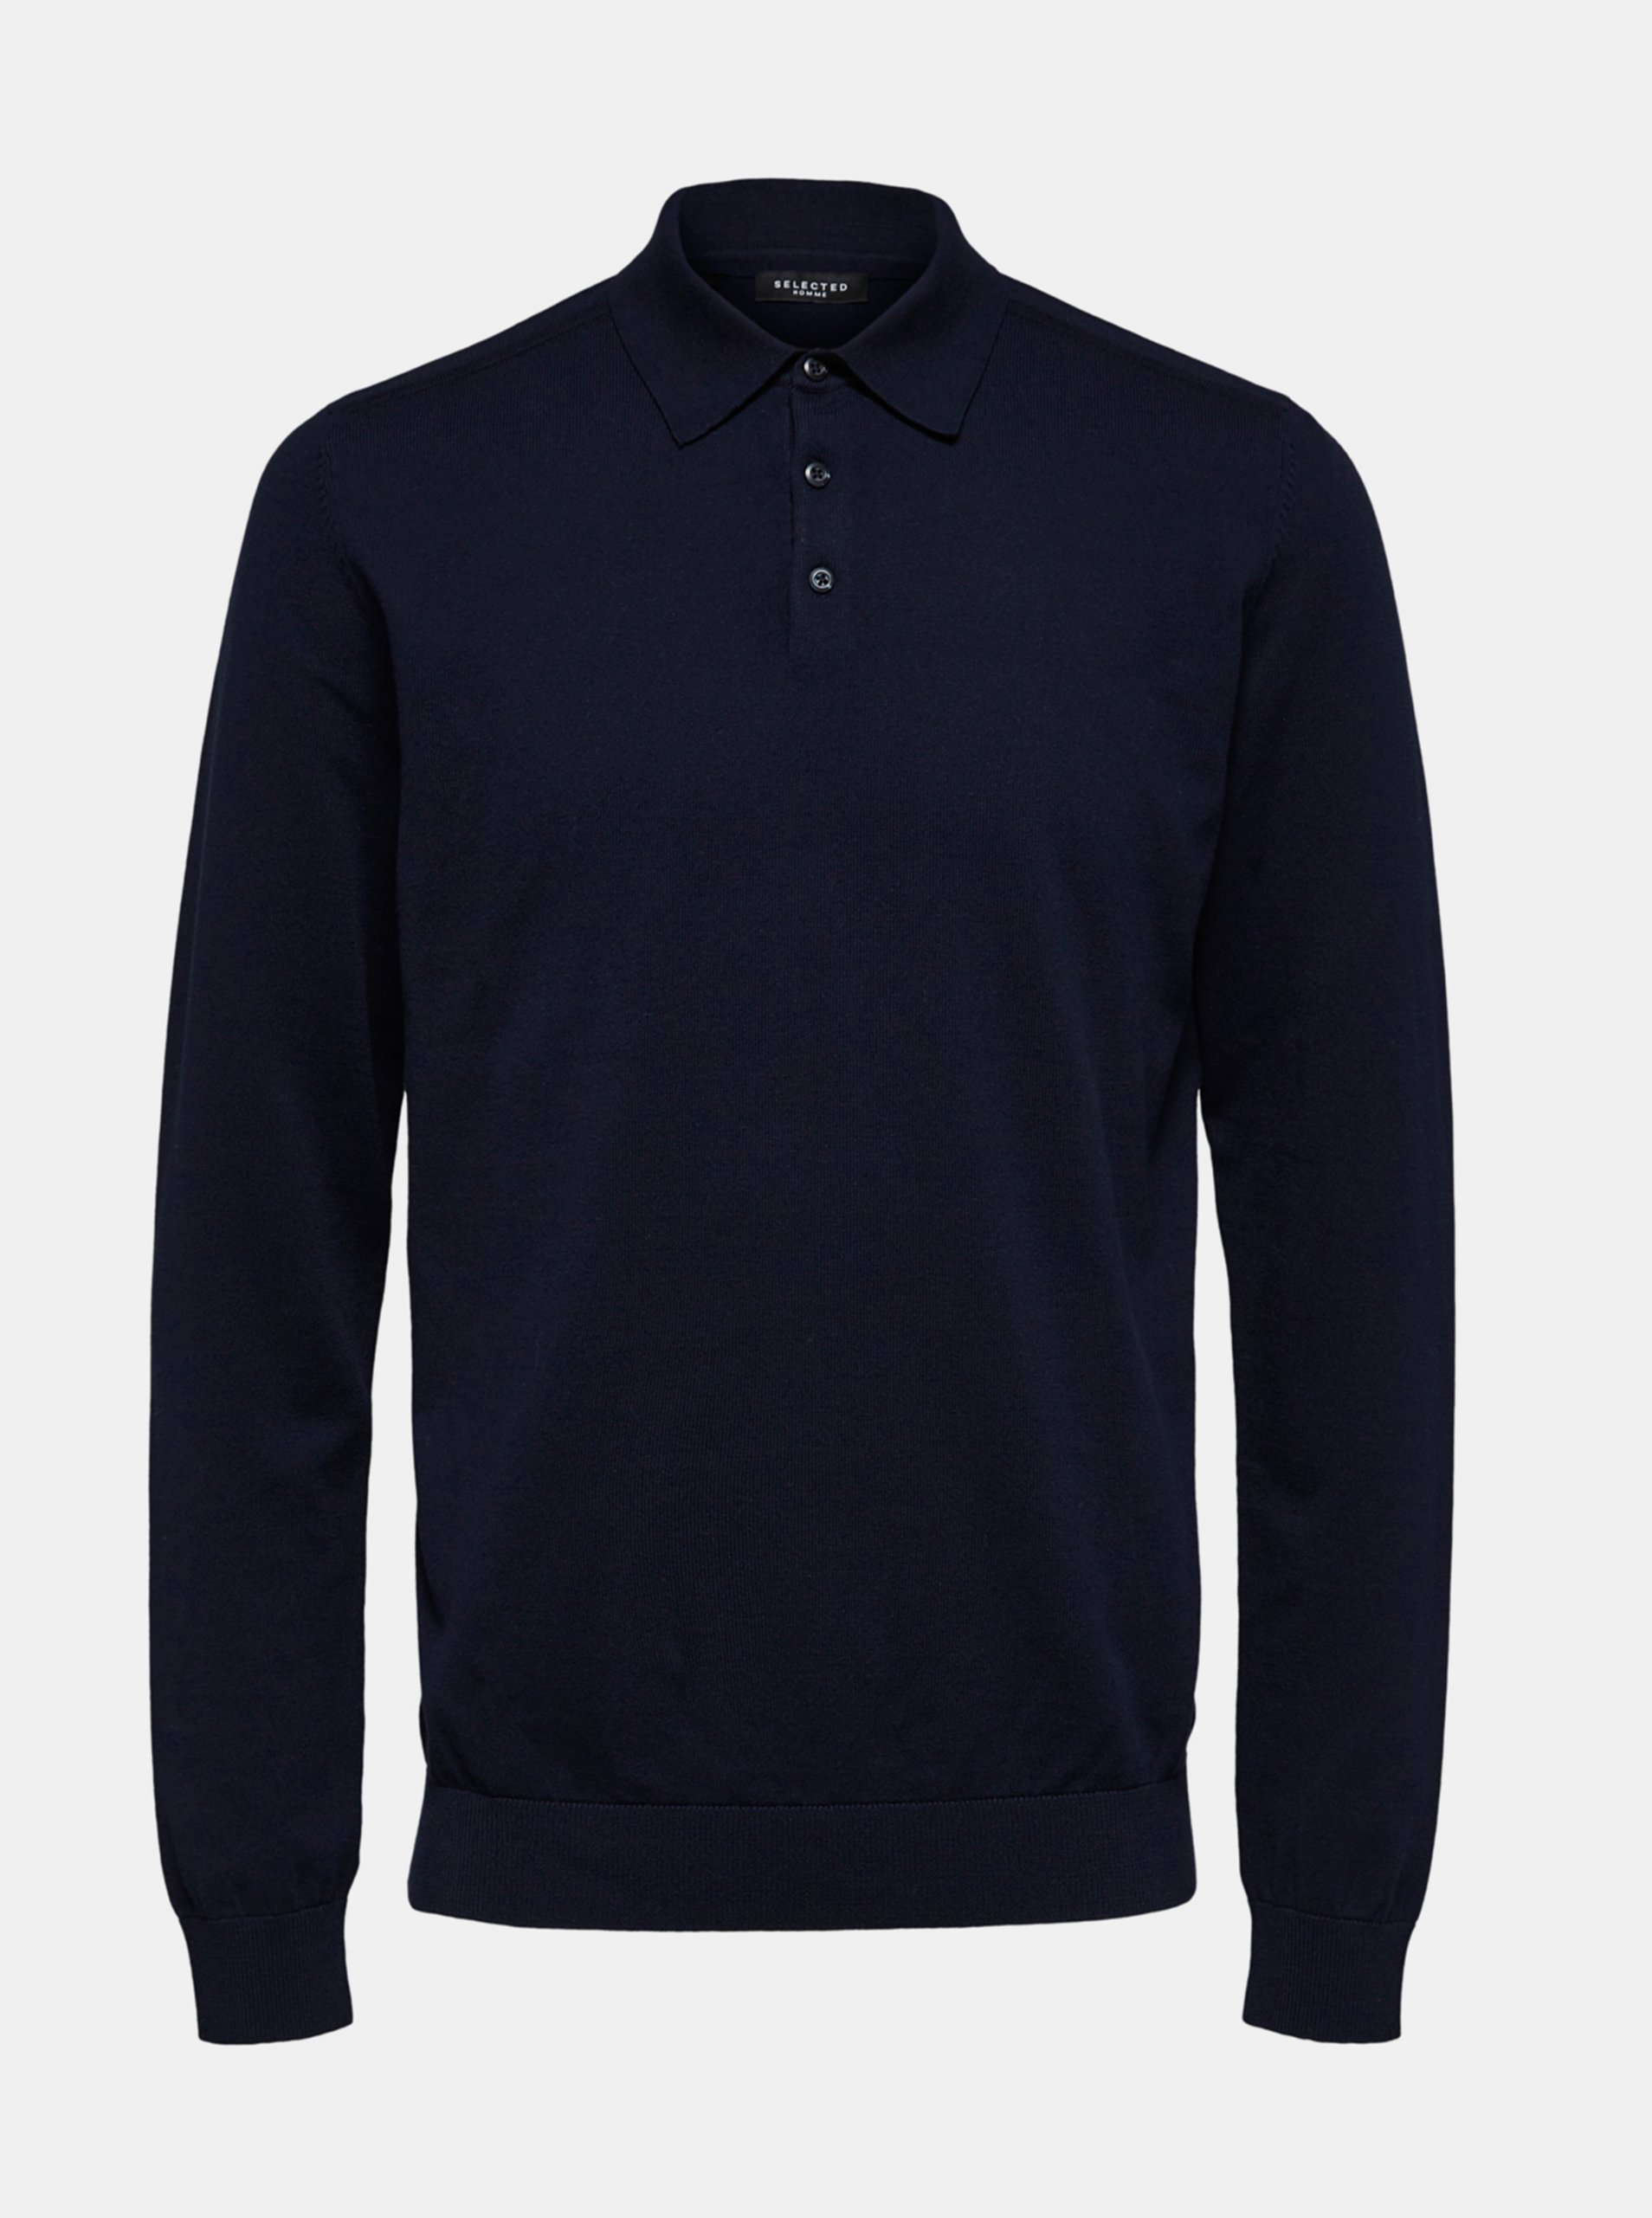 Modrý sveter s limcom Selected Homme.